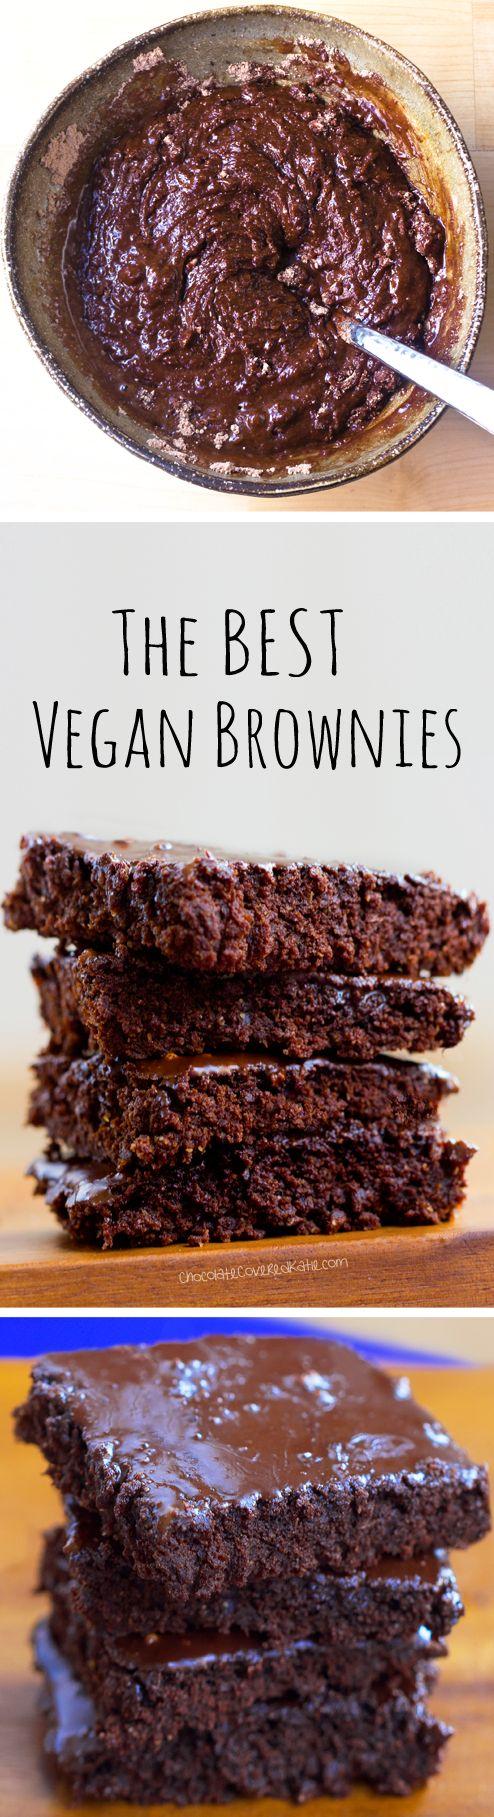 The BEST Vegan Brownies Recipe - NO Tofu, NO Beans, and...